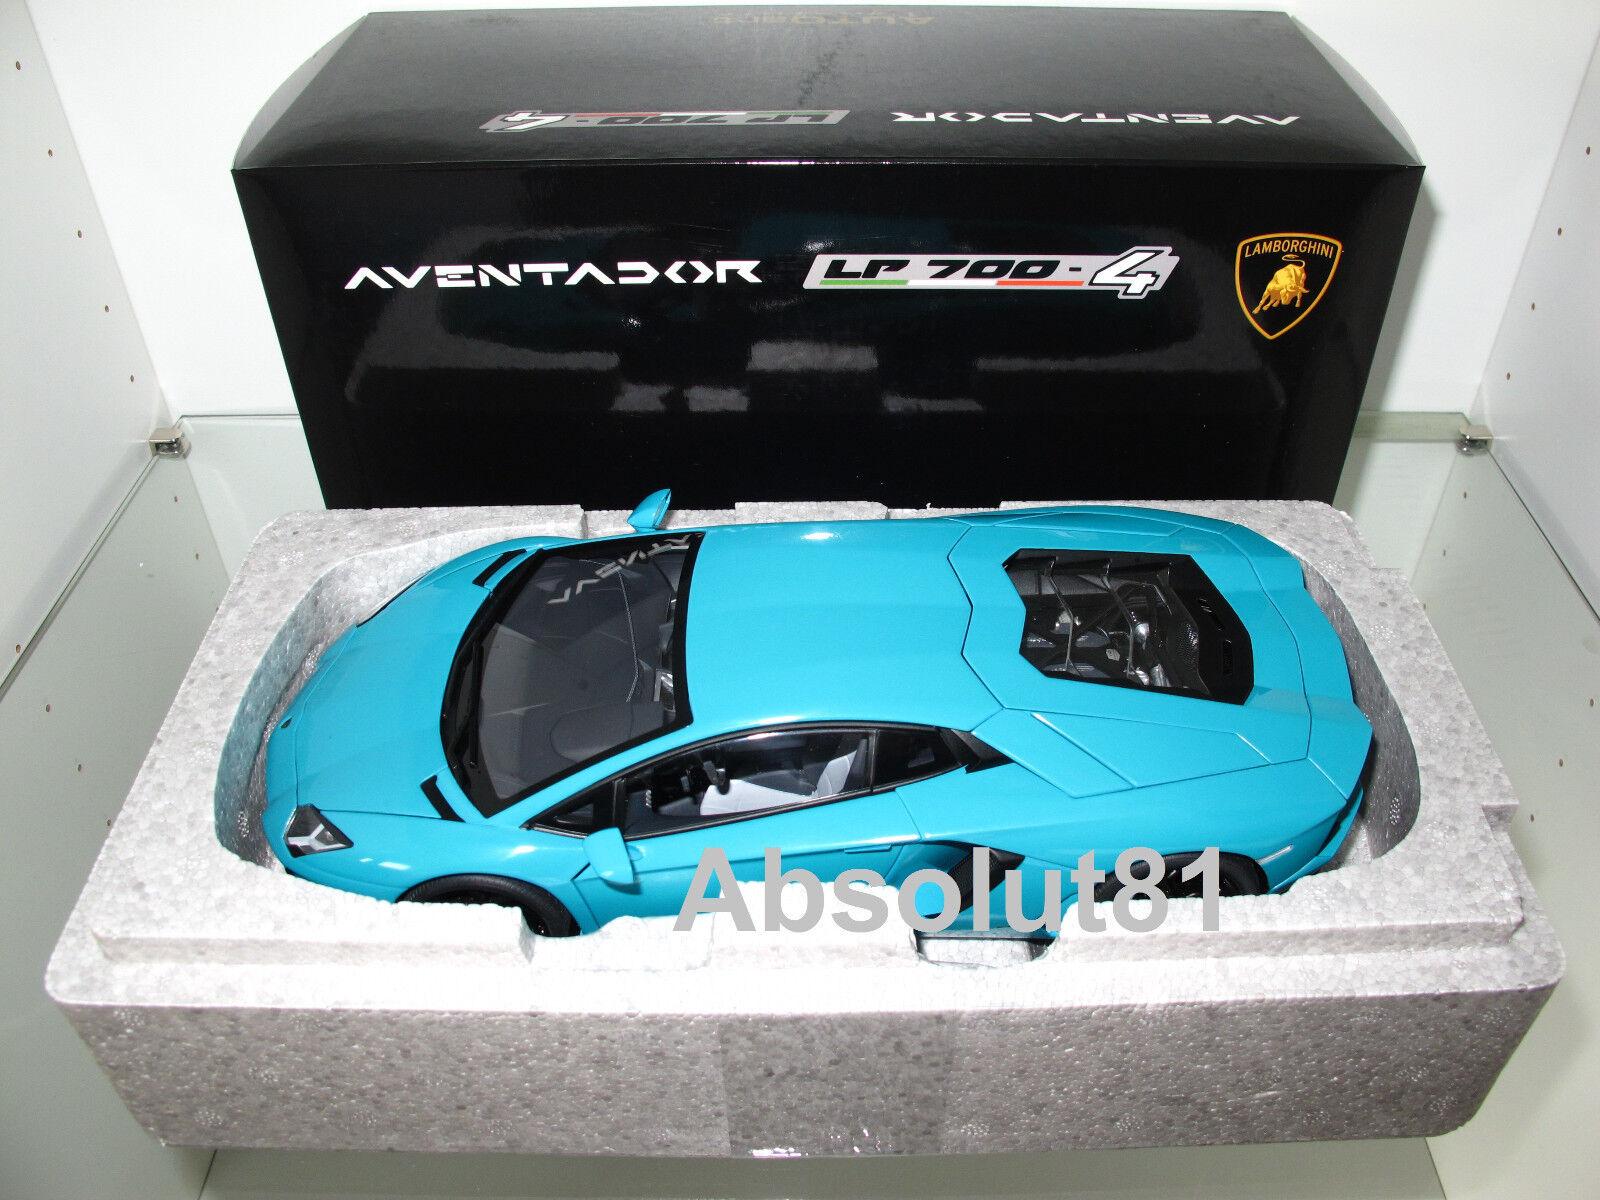 1 18 Autoart Lamborghini aventador lp700-4 turquoise, 74667 NOUVEAU & NEUF dans sa boîte RARE